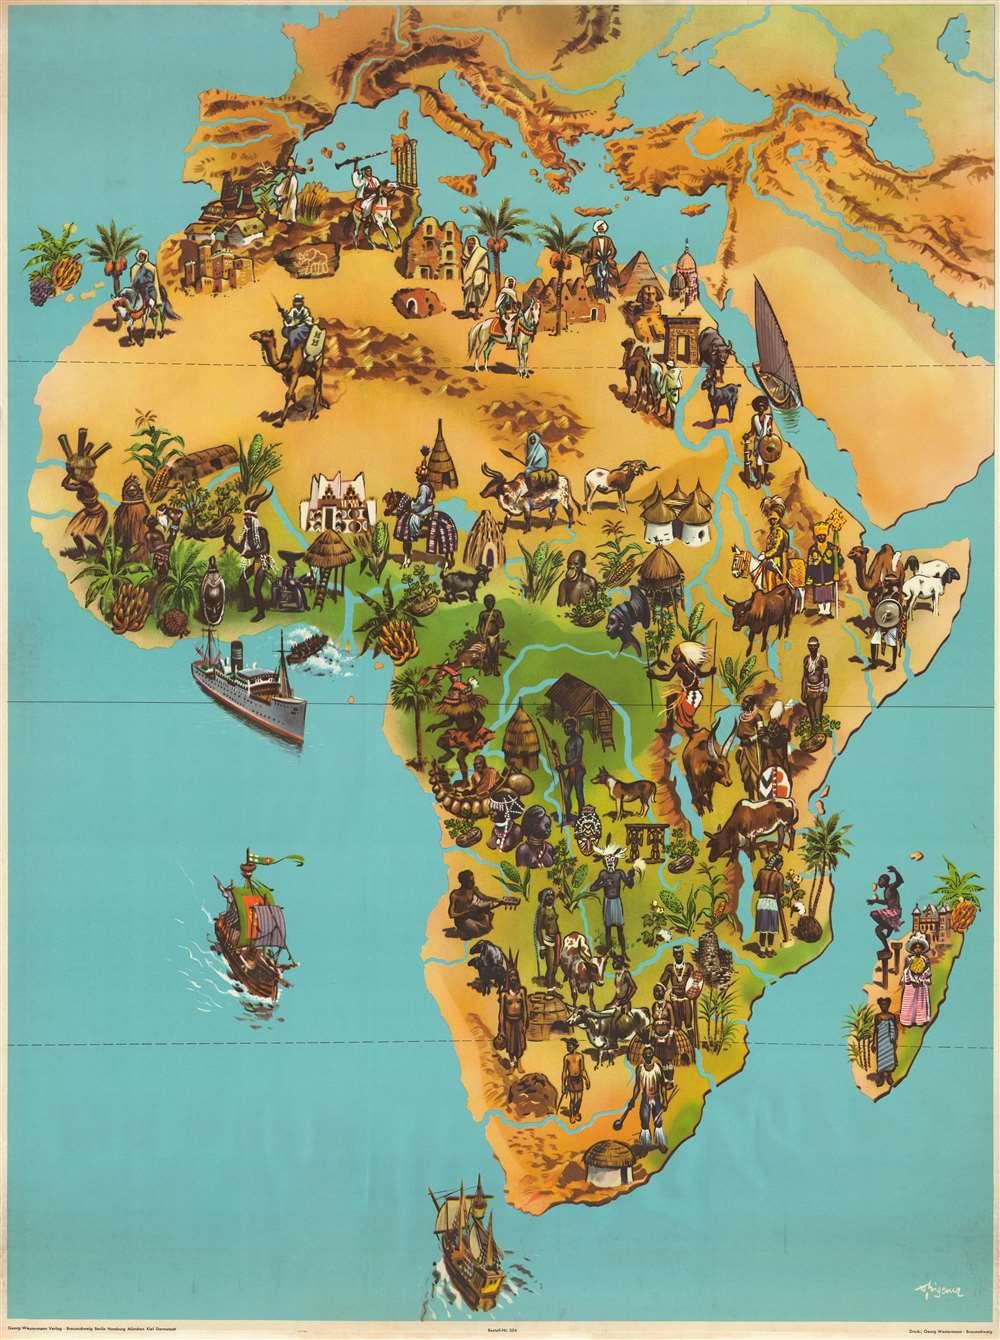 [Africa]. - Main View